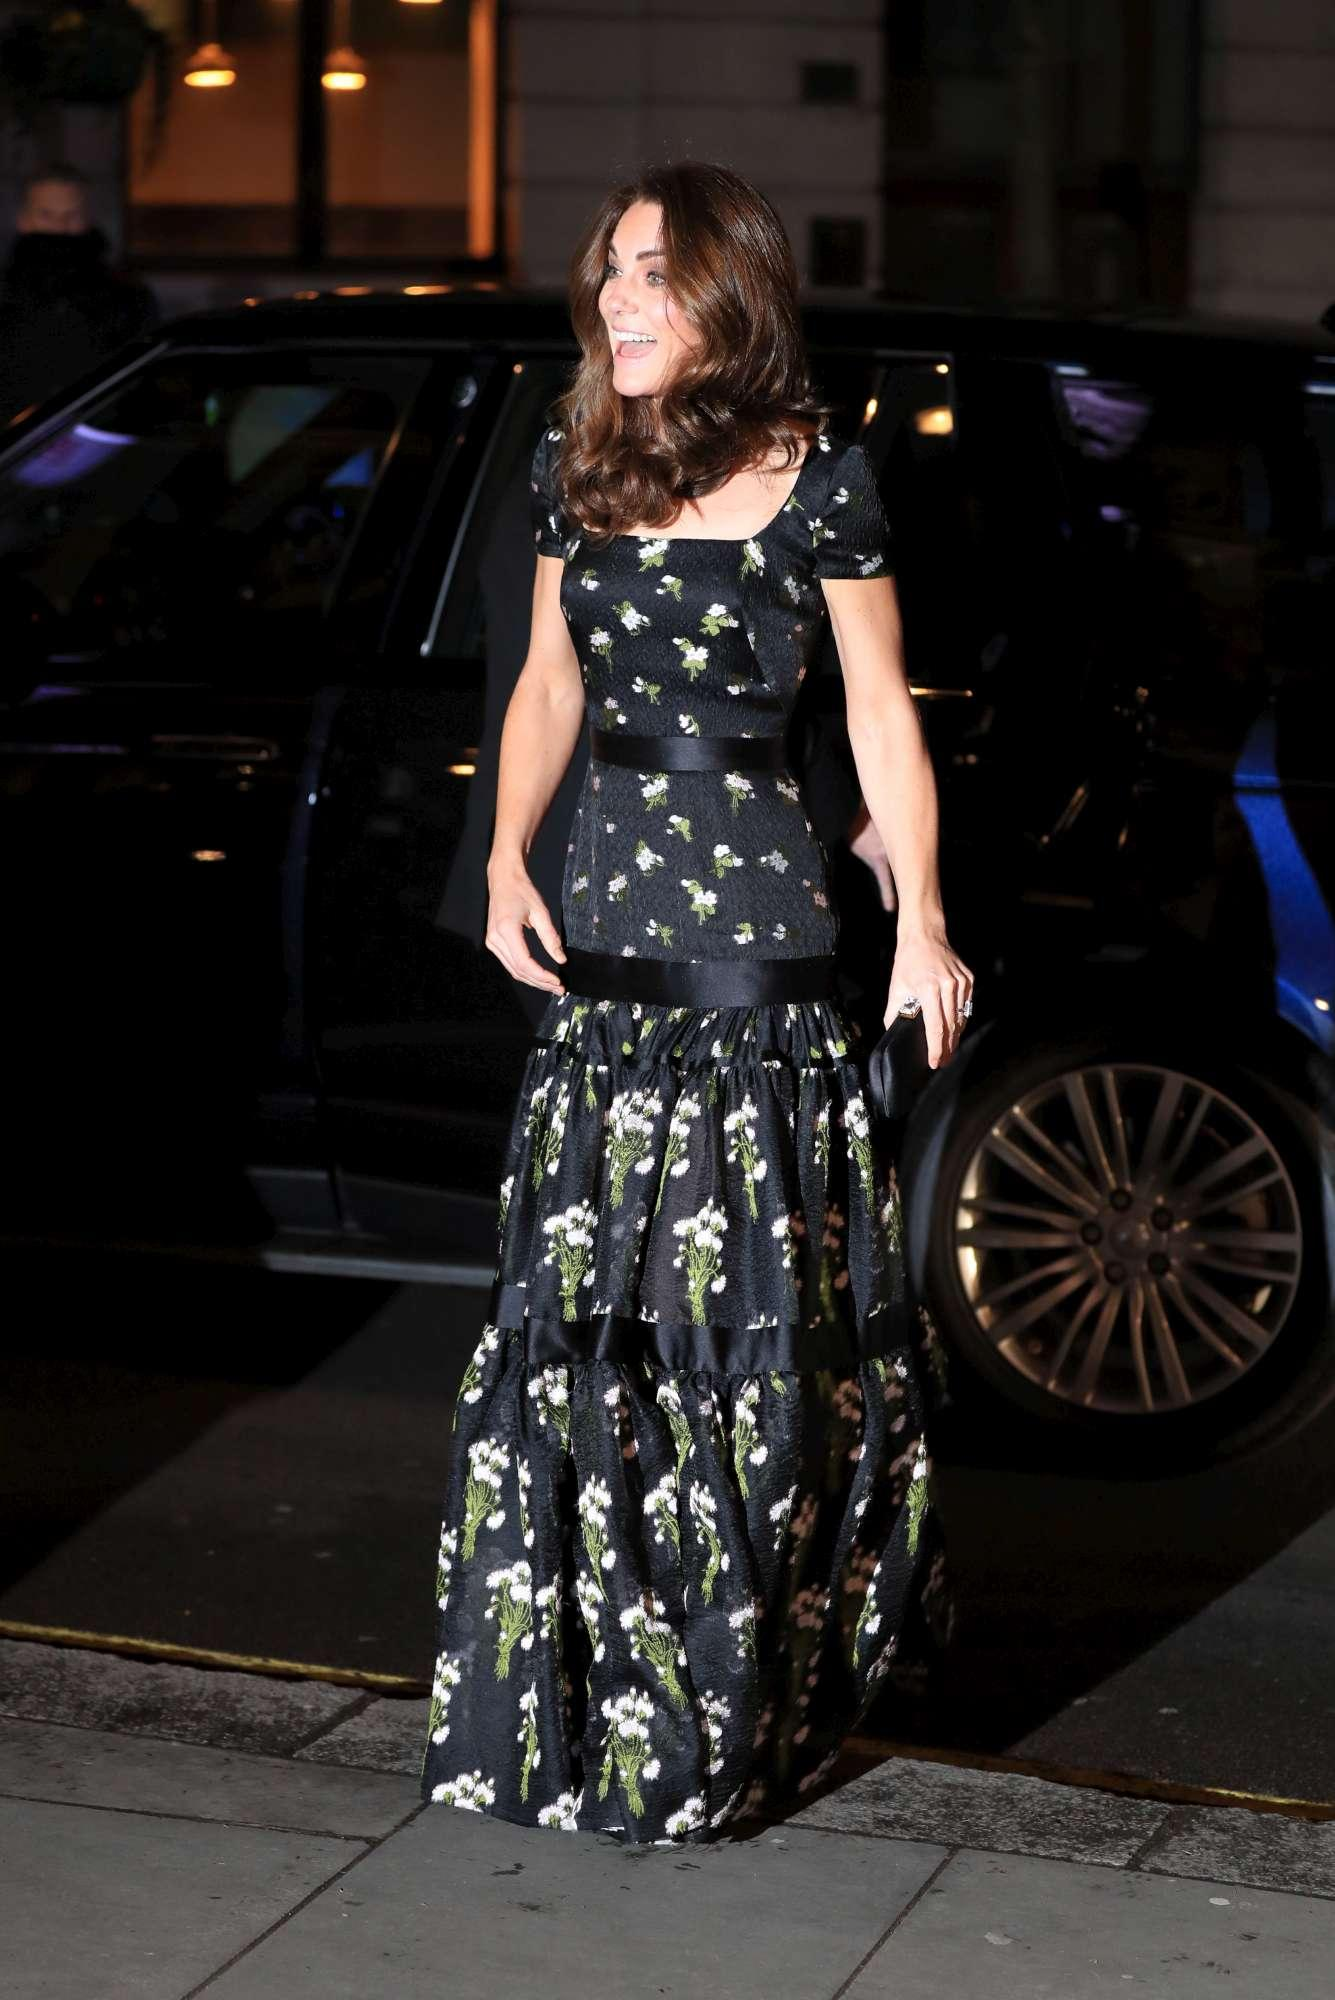 Kate Middleton alla serata di gala con i Beckham e la Moss